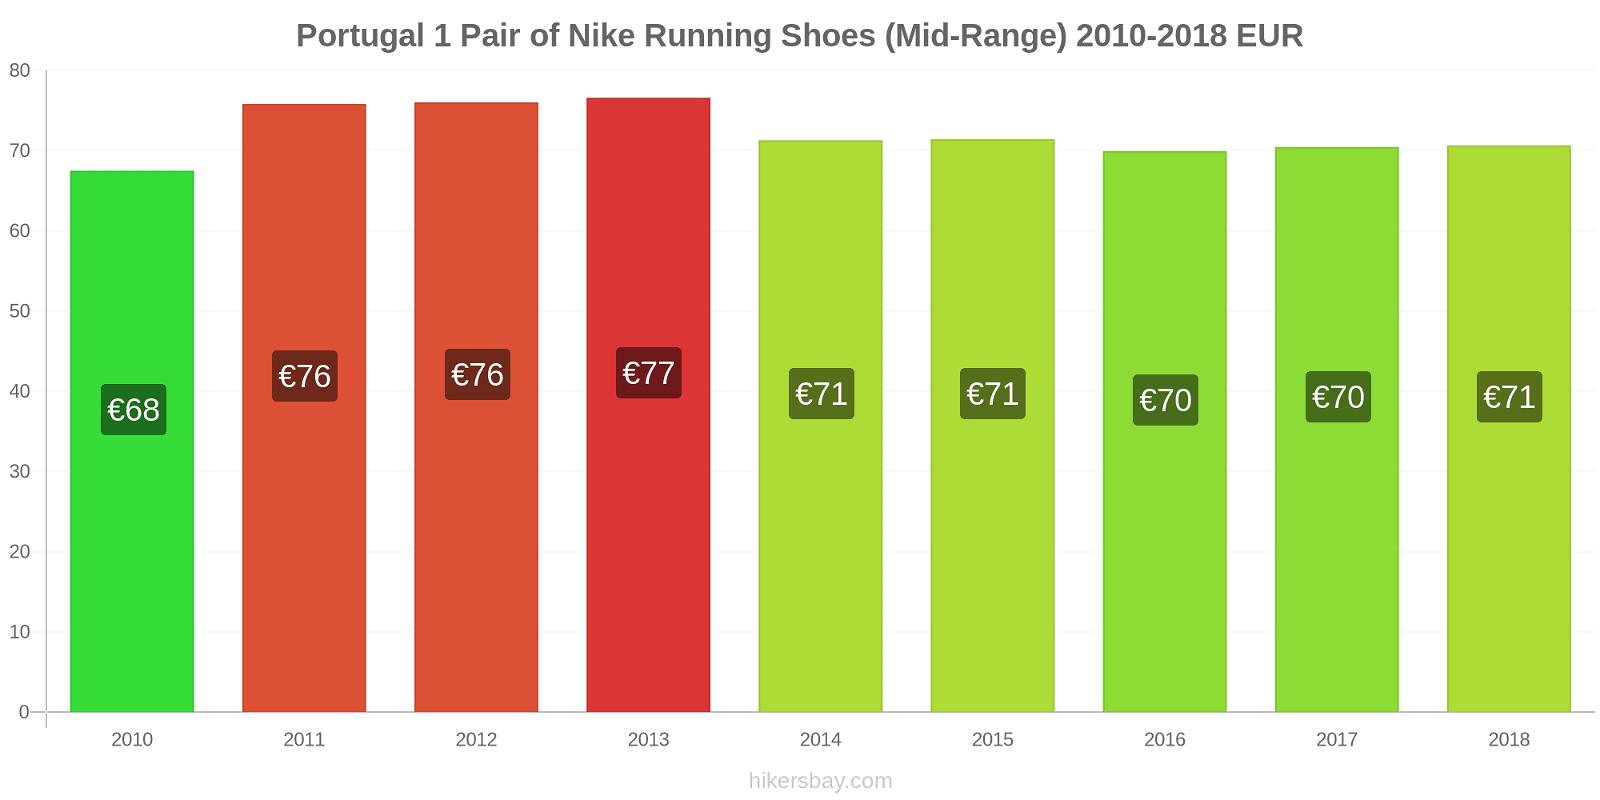 Portugal price changes 1 Pair of Nike Running Shoes (Mid-Range) hikersbay.com